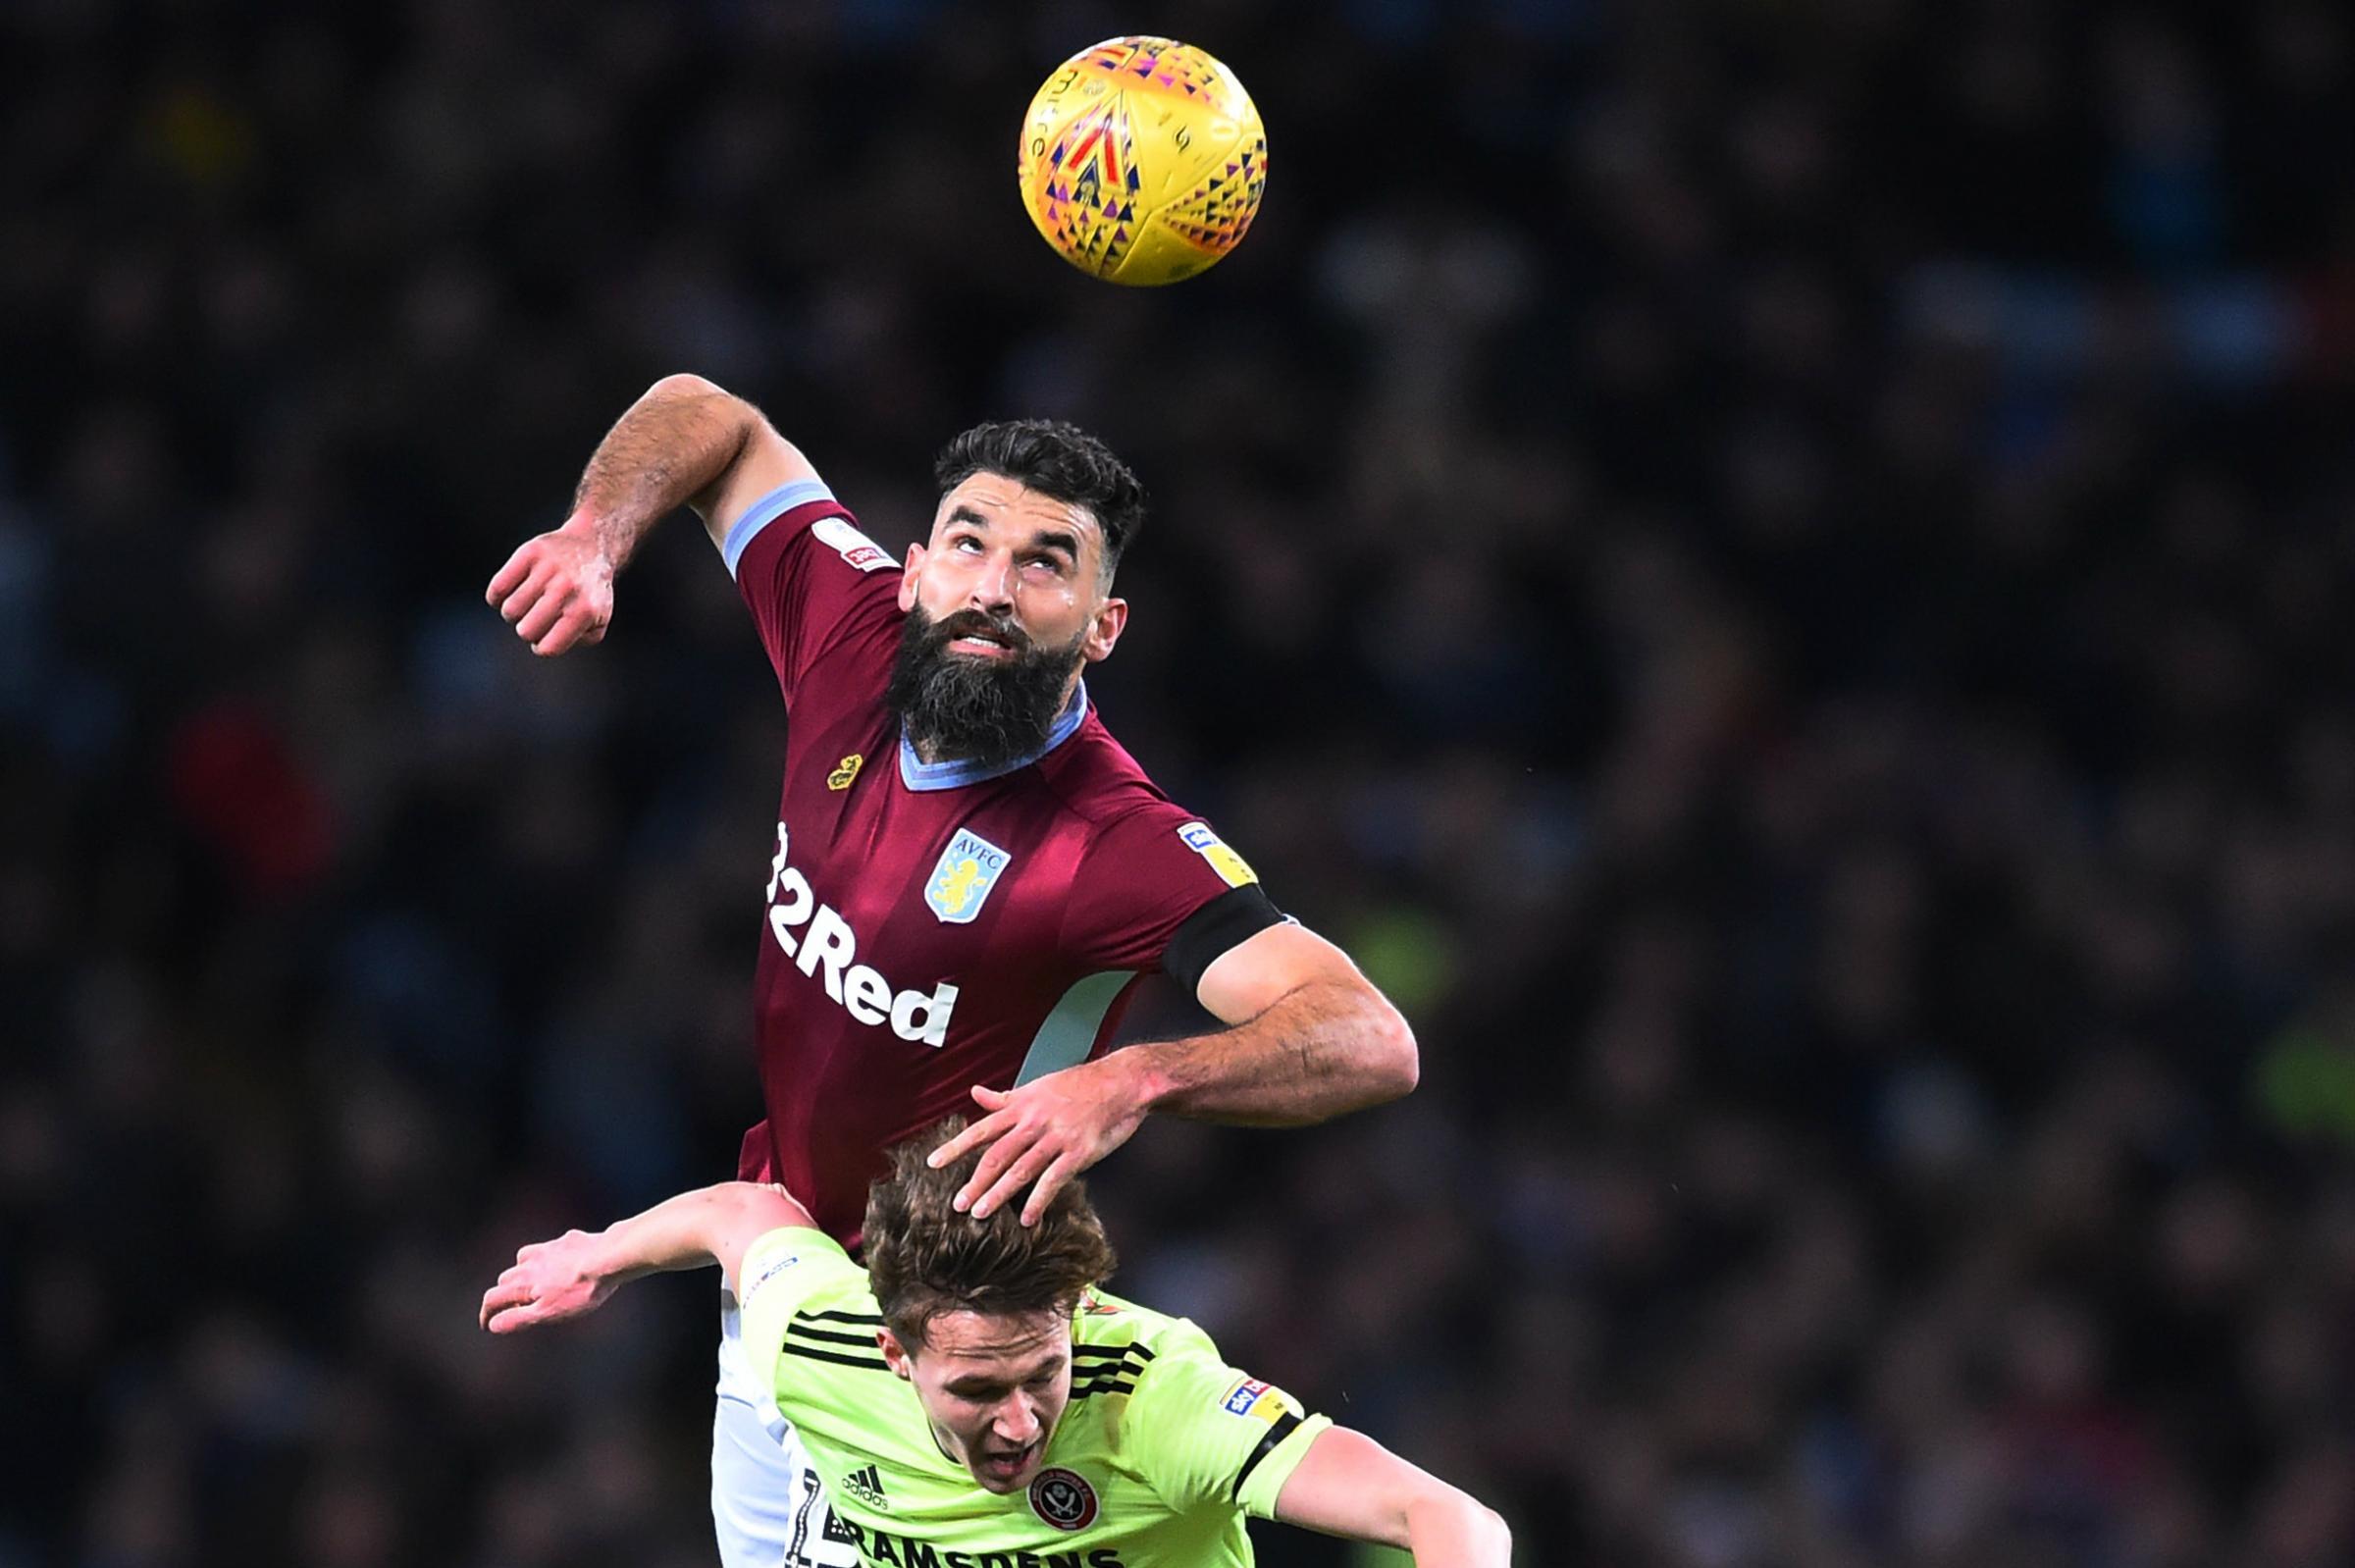 Mile Jedinak wins a header against Sheffield United